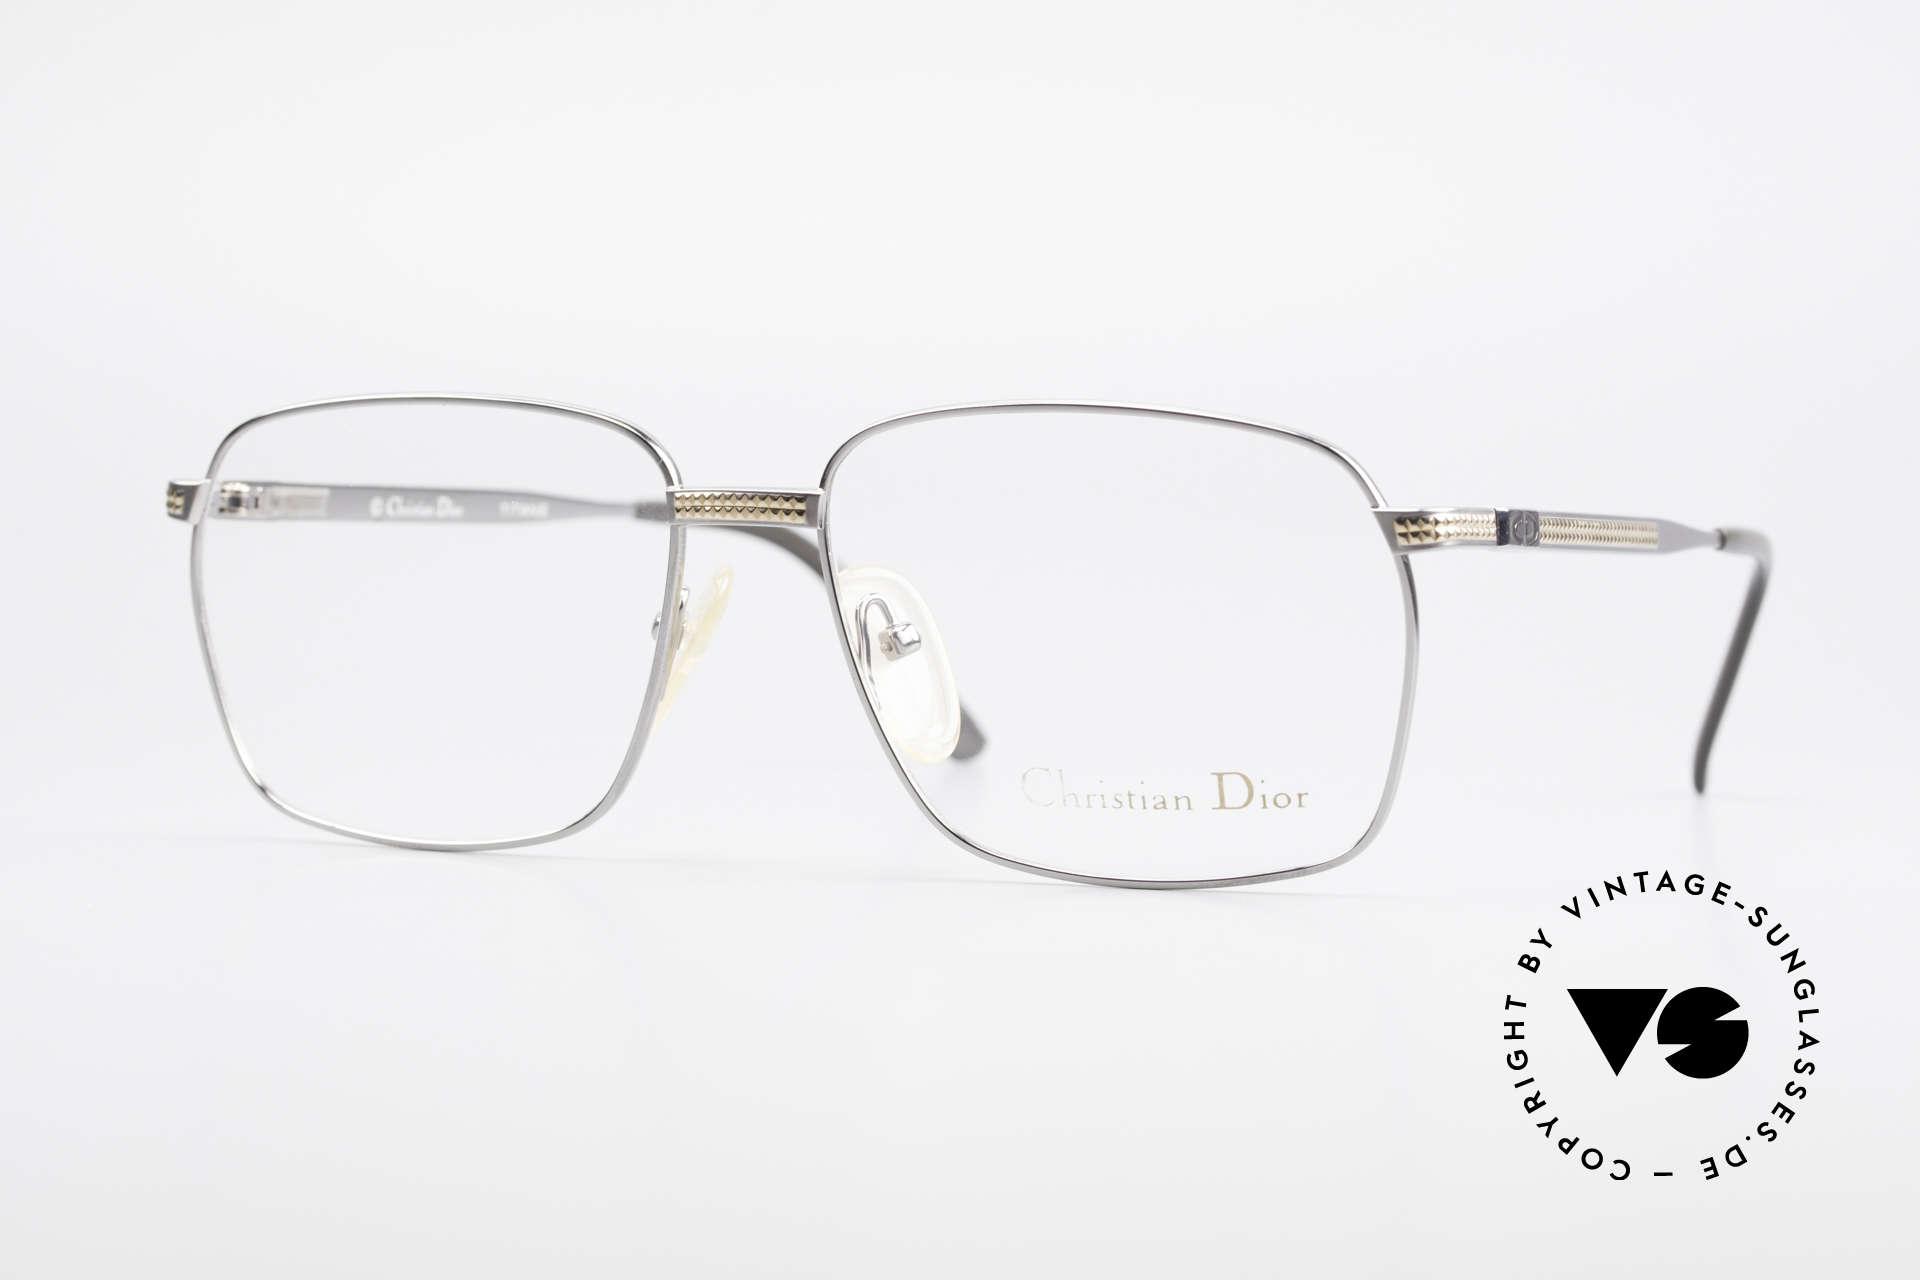 Christian Dior 2791 Titanium Eyeglass-Frame 90's, masculine designer glasses by Christian Dior from 1992, Made for Men